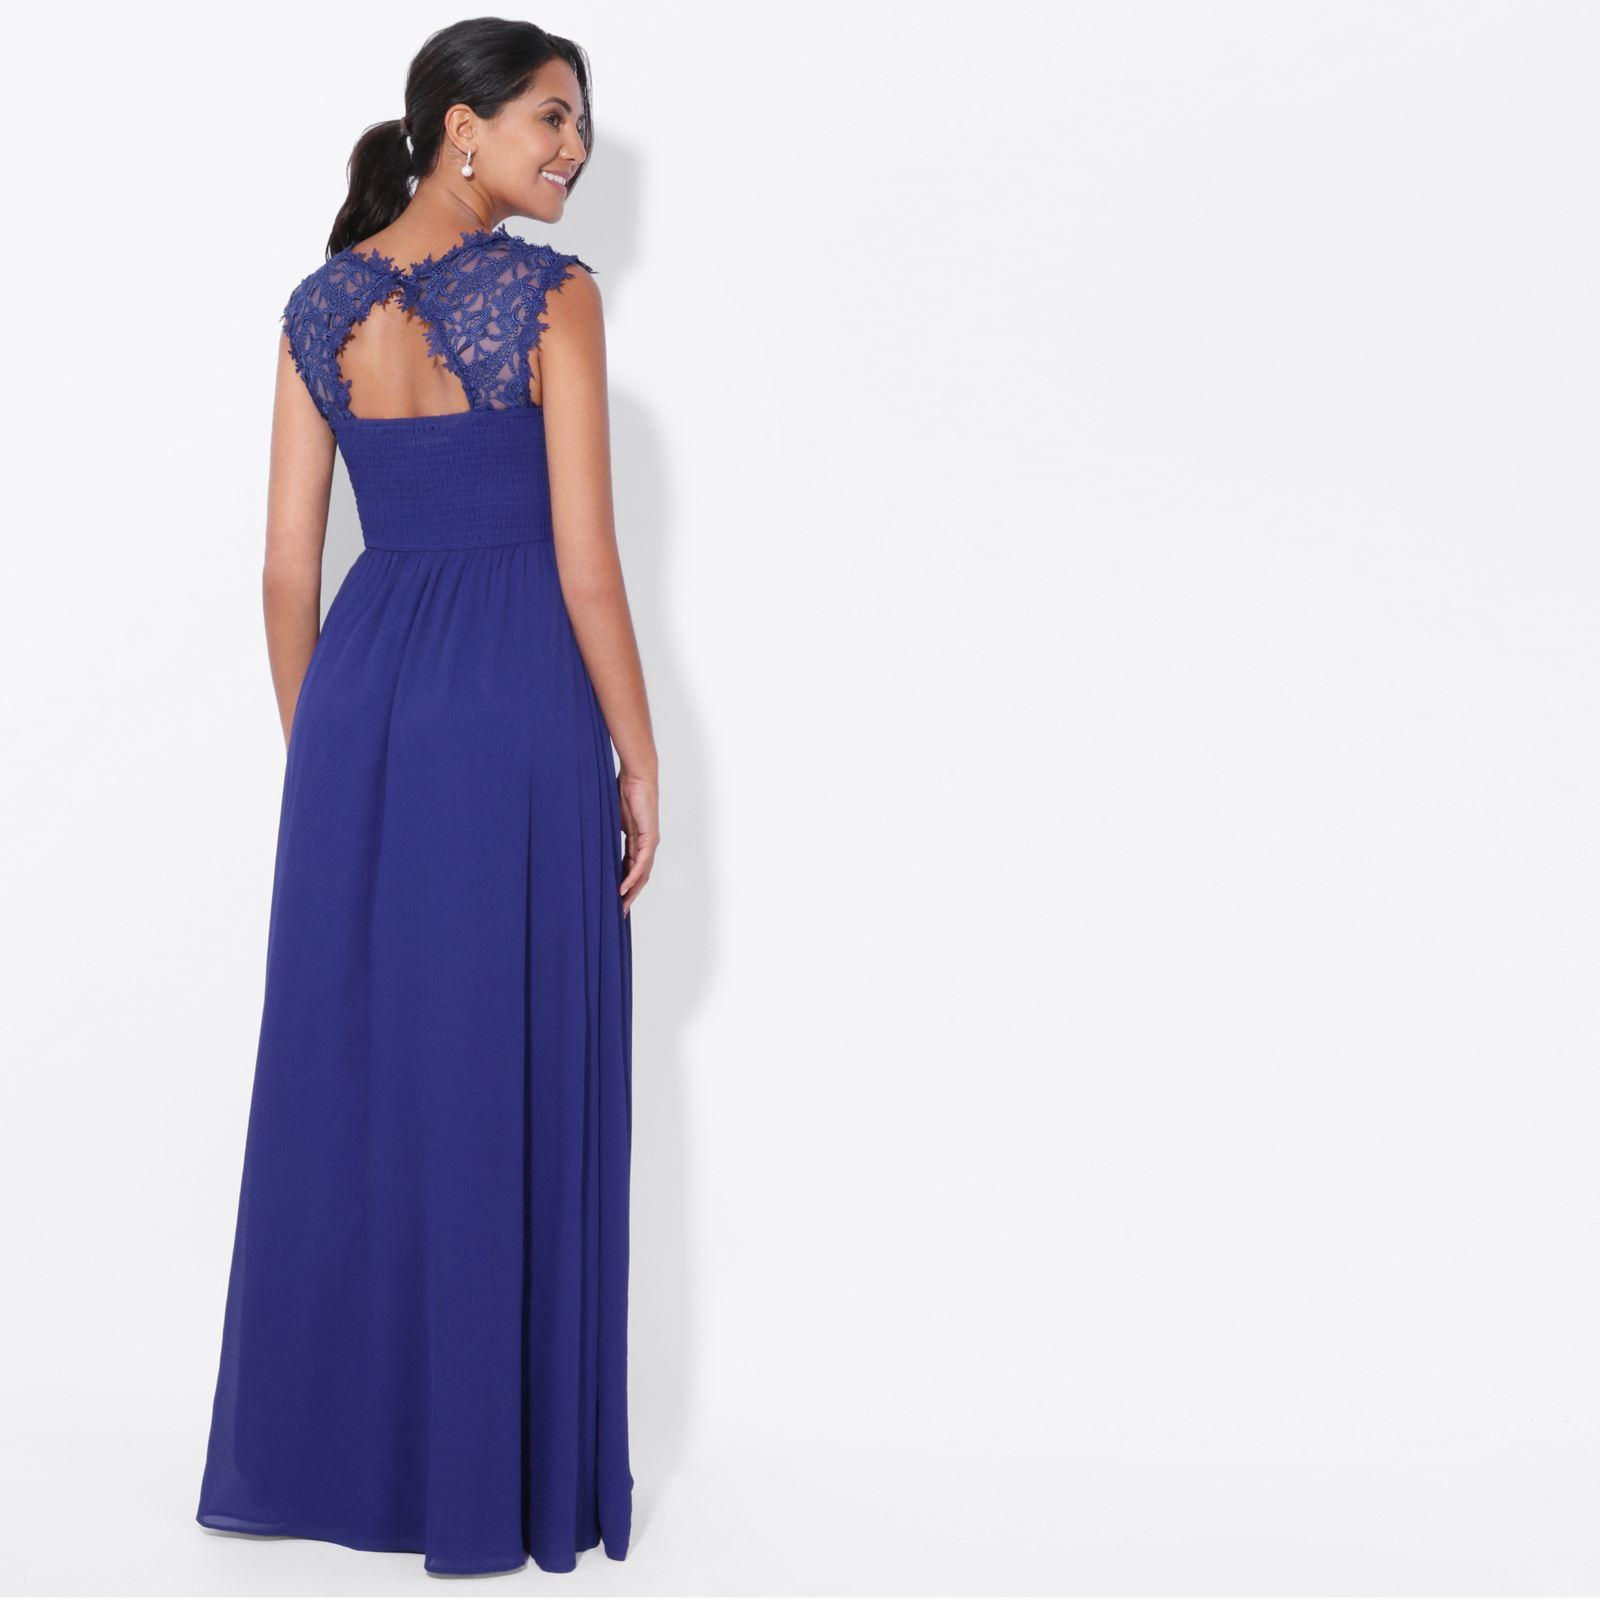 Womens-Wedding-Bridesmaid-Prom-Dress-Formal-One-Off-Shoulder-Long-Evening-8-18 thumbnail 63